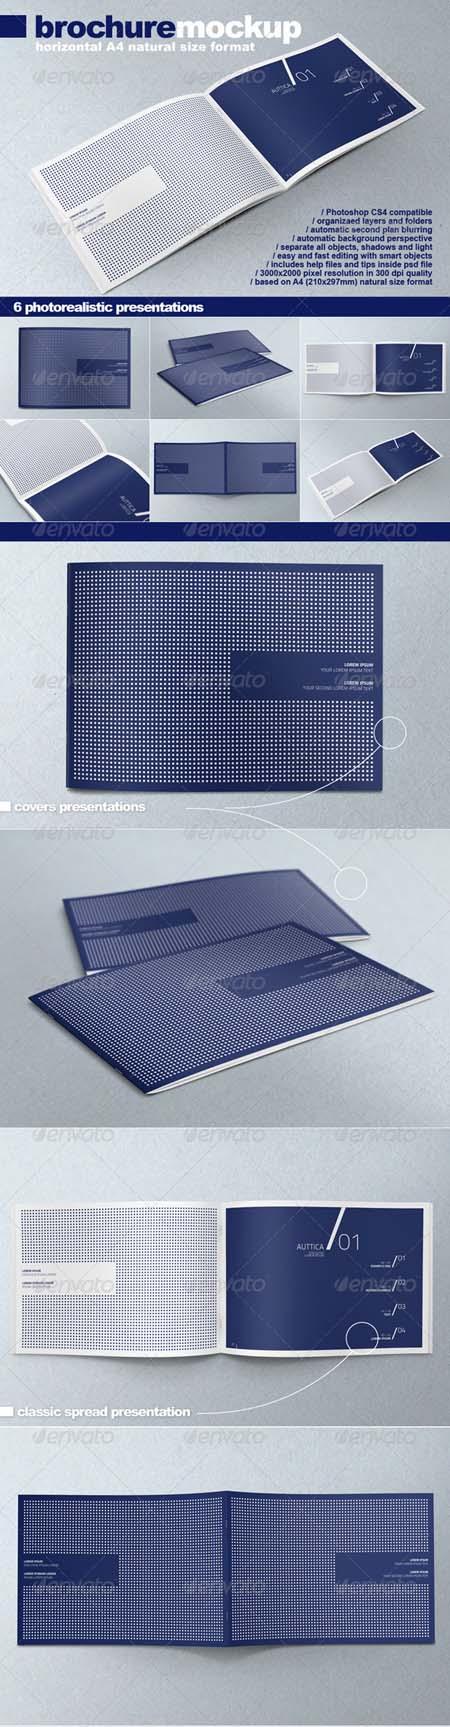 14 tabloid horizontal brochure mockups psd images tri for Horizontal brochure template